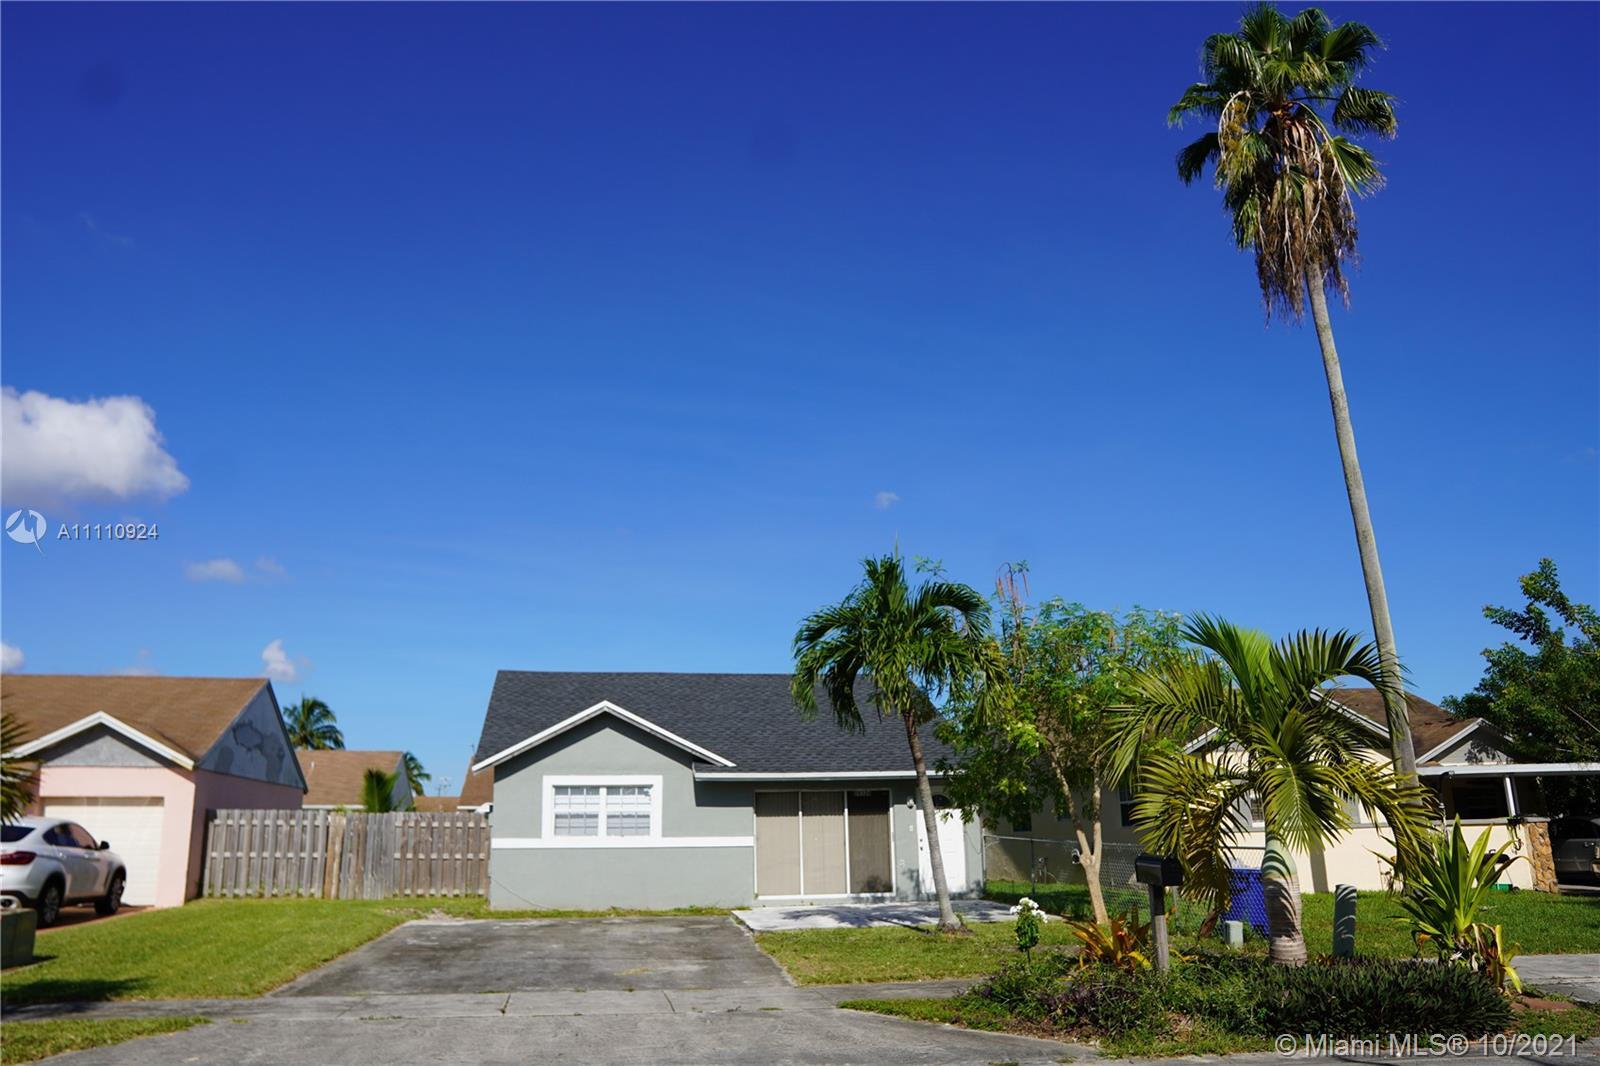 Single Family Home,For Sale,20320 NW 35th Ave, Miami Gardens, Florida 33056,Brickell,realty,broker,condos near me